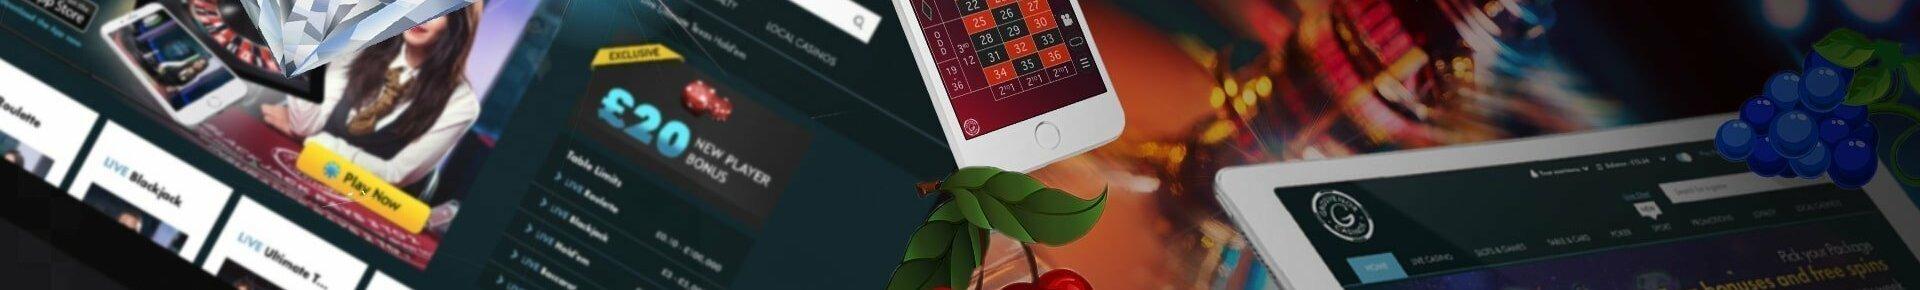 Grosvenor Casino review UK